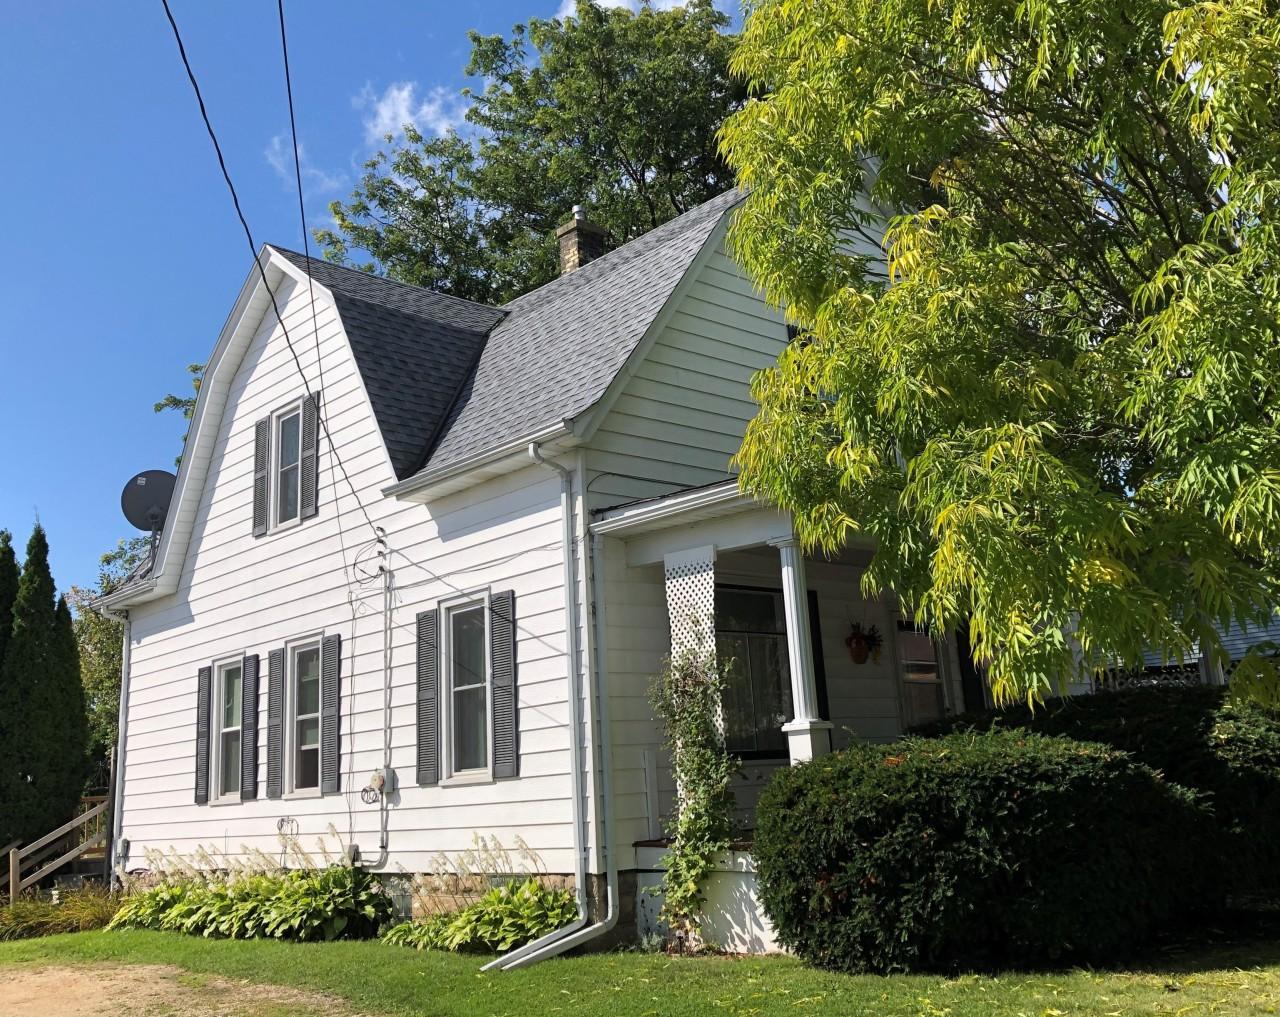 37 E State St Hartford, WI 53027 Property Image